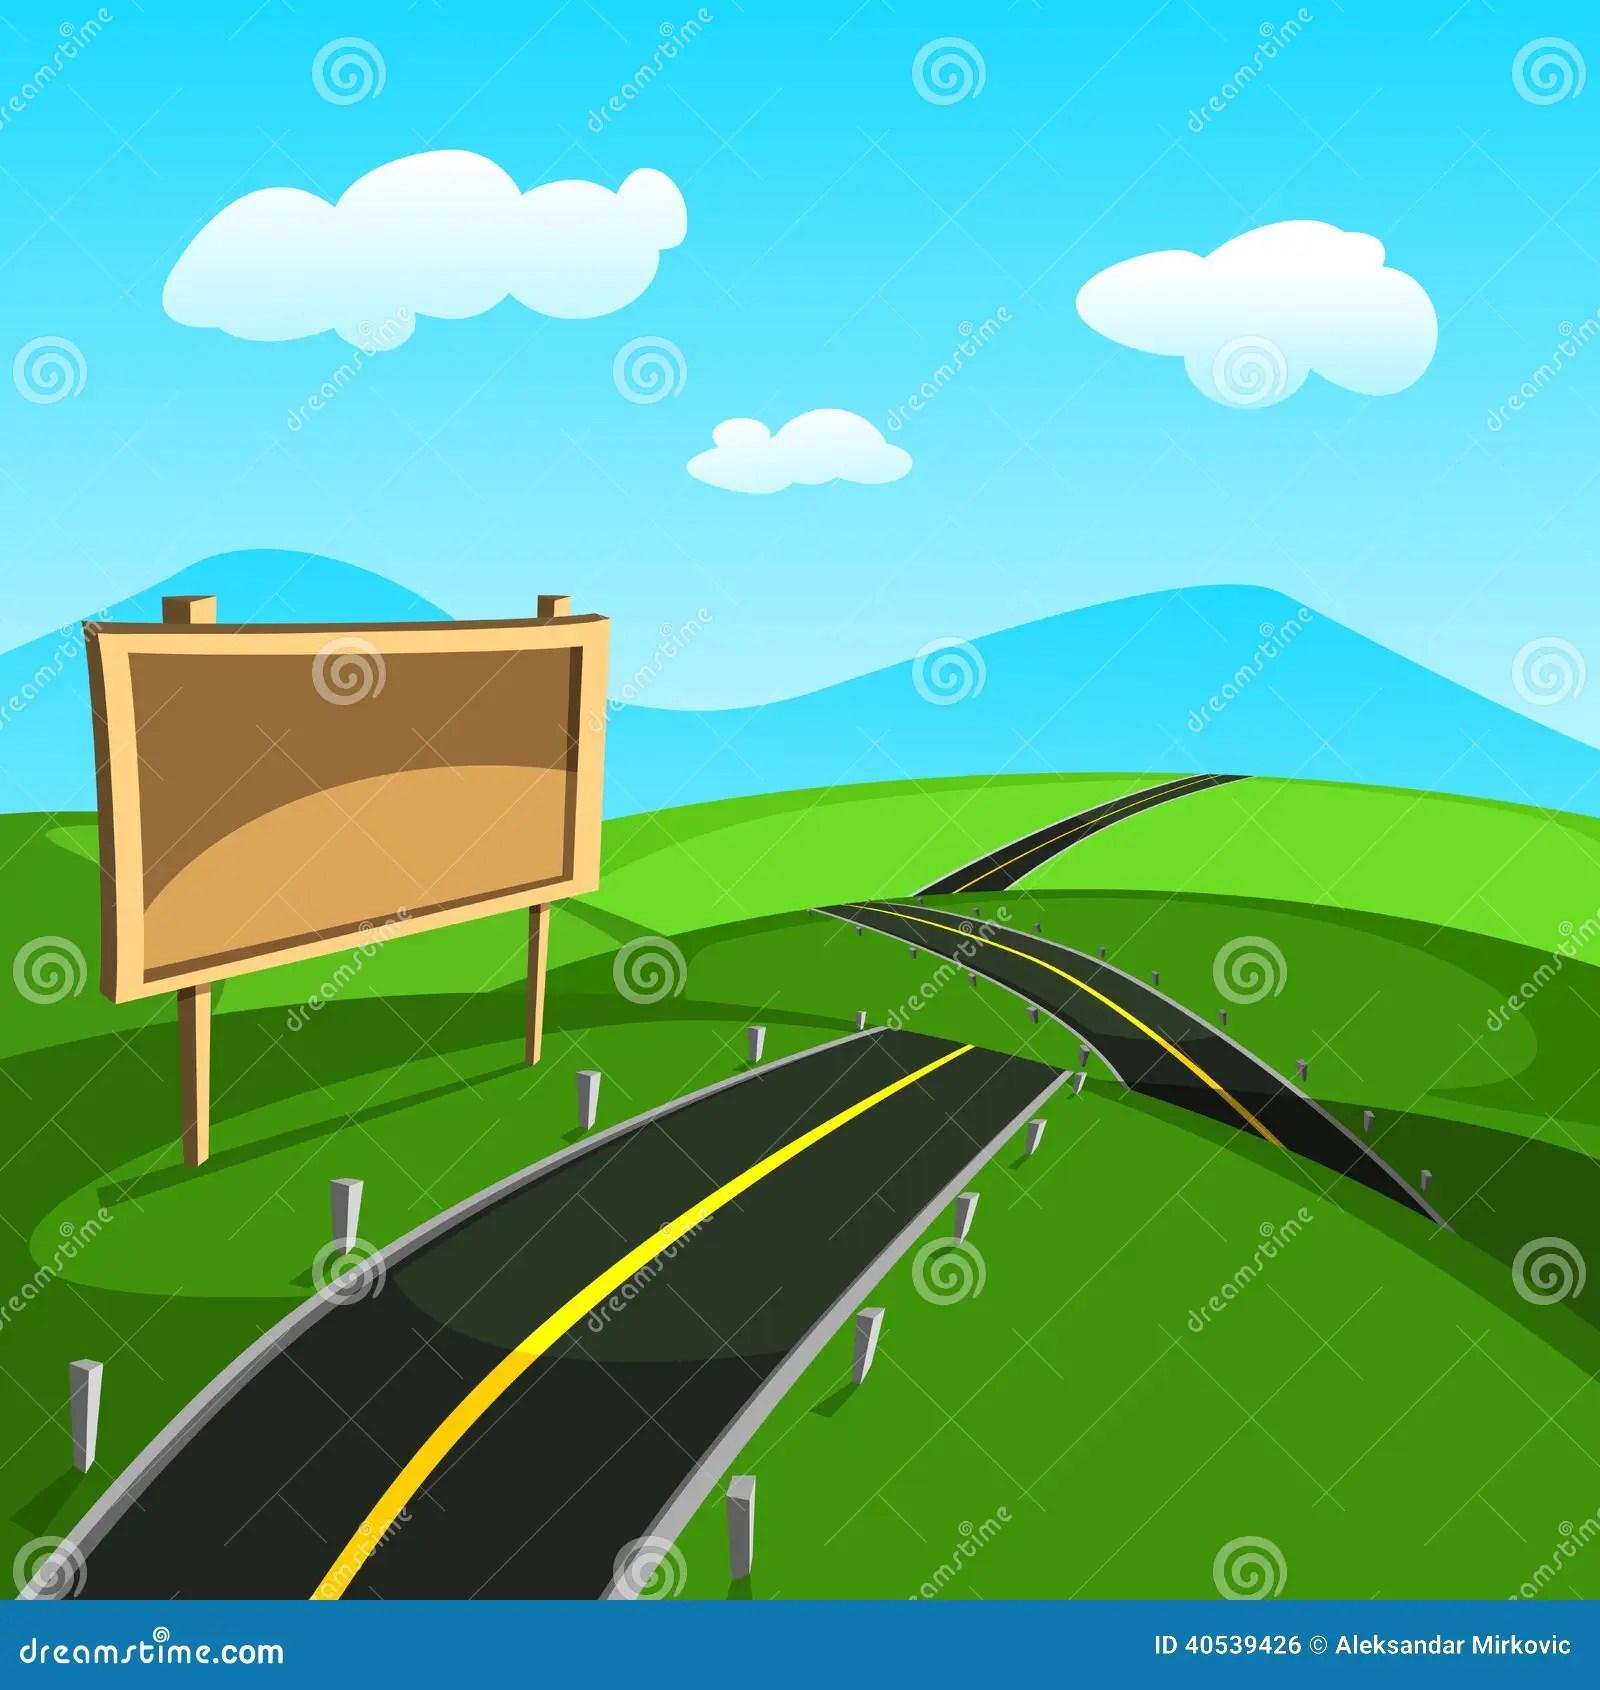 Car Curvy Road Wallpaper Road Vector Stock Vector Illustration Of Season Backdrop